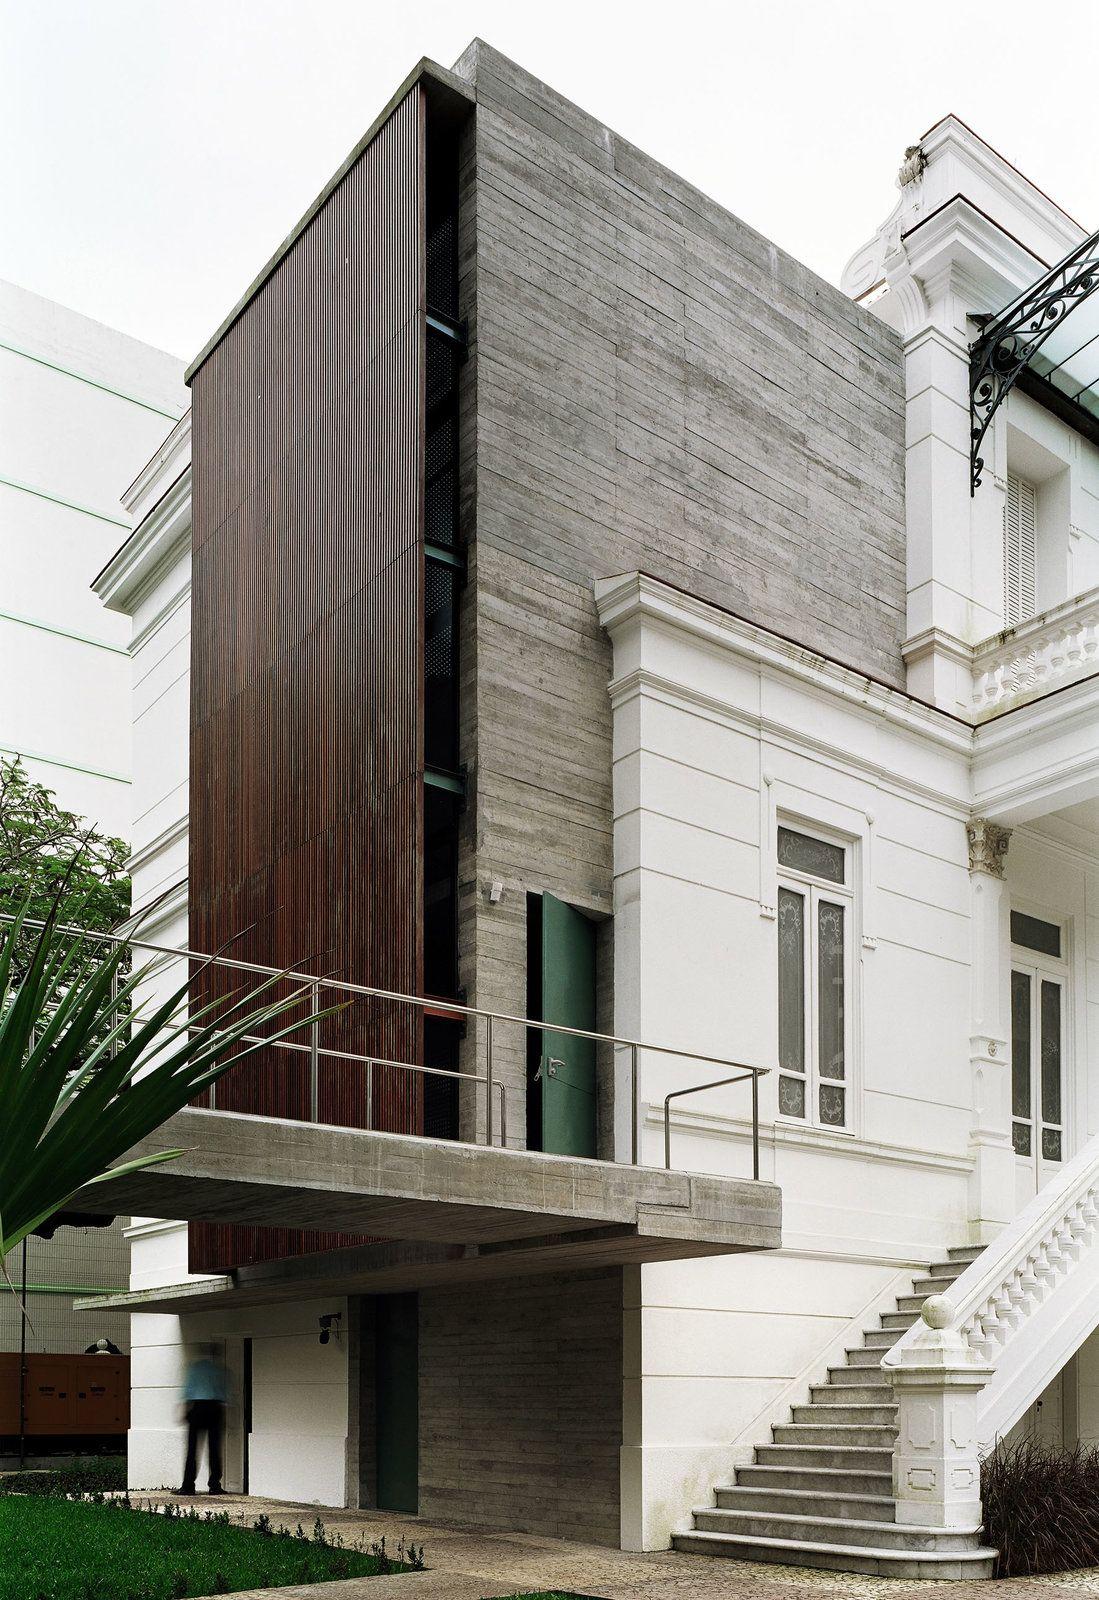 museu rodin bahia - Google Search | architecture | Pinterest ...